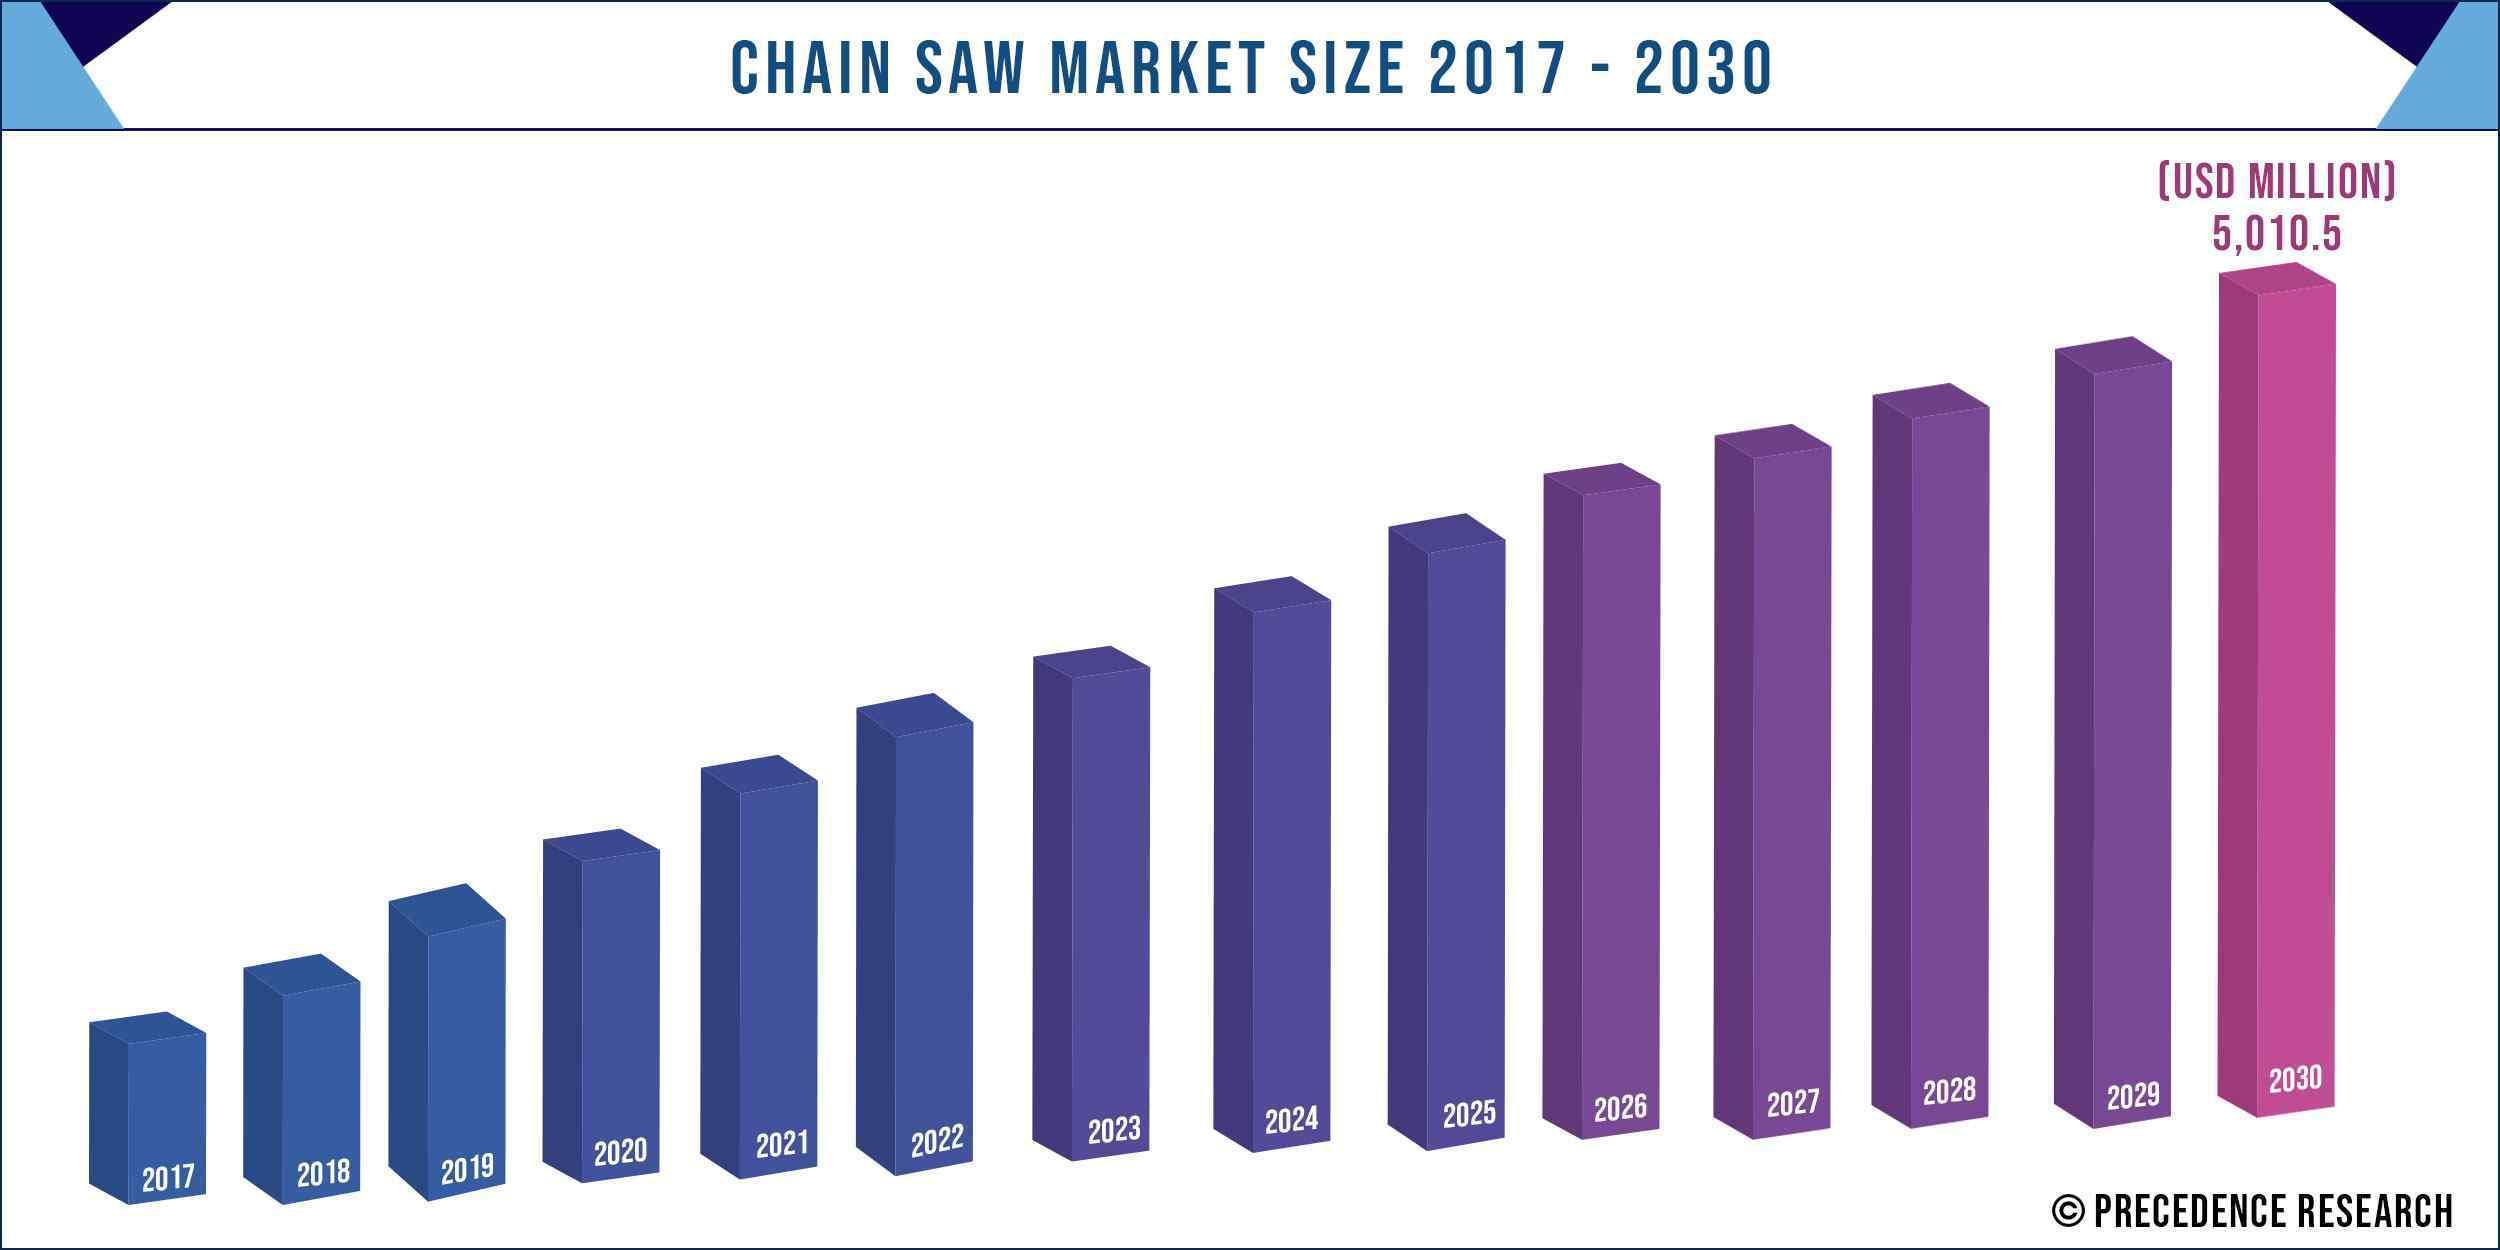 Chainsaw Market Size 2017-2030